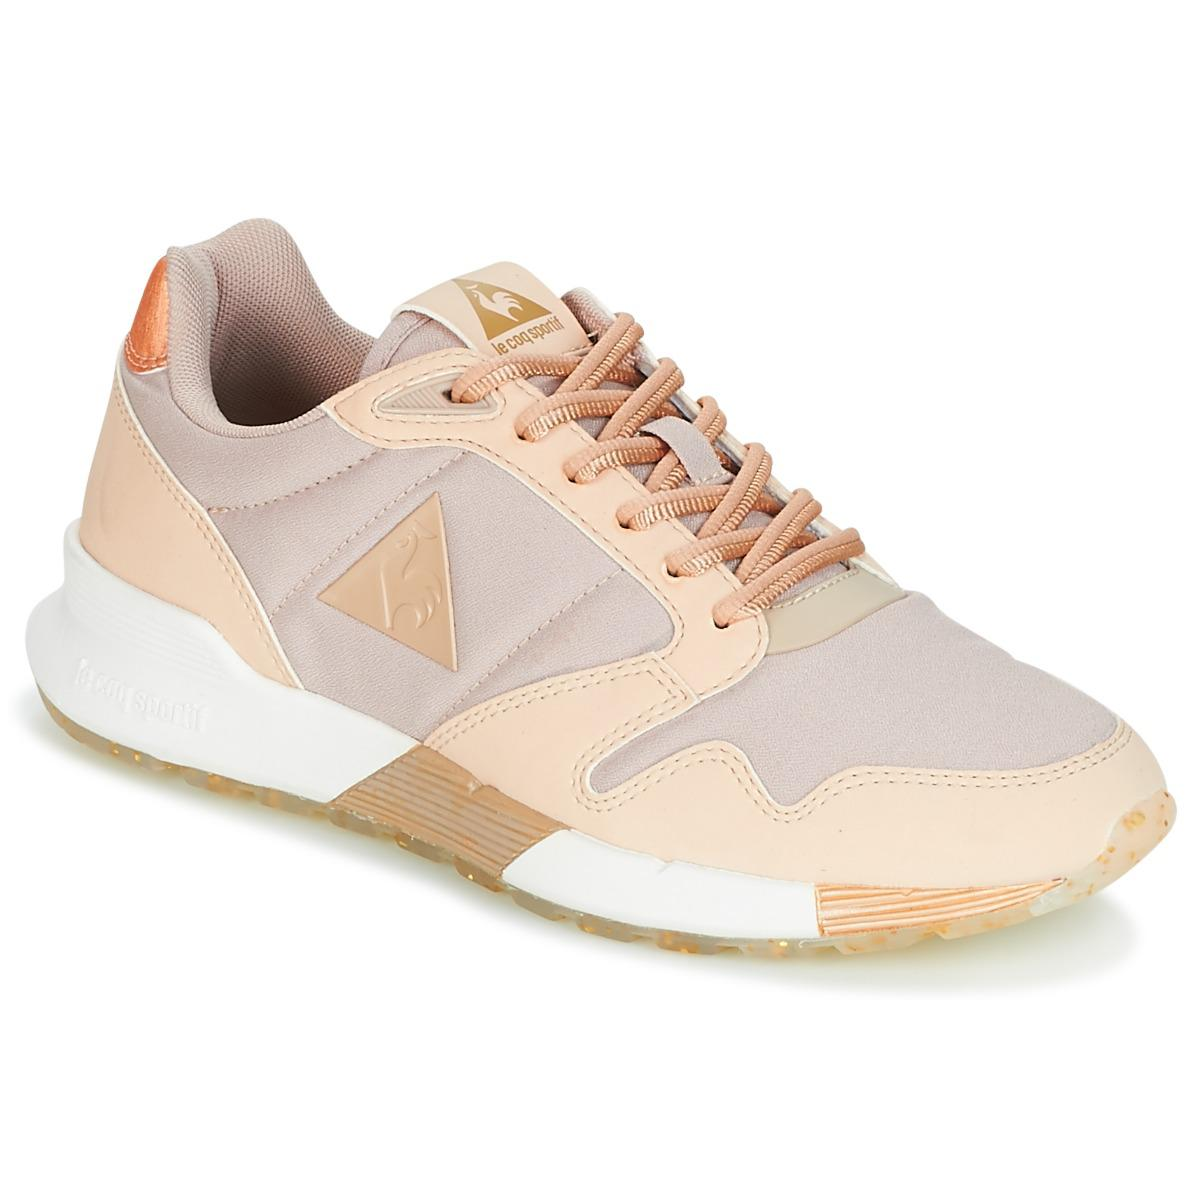 e45a8008e1ff Le Coq Sportif Omega X W Metallic Women s Shoes (trainers) In Pink ...